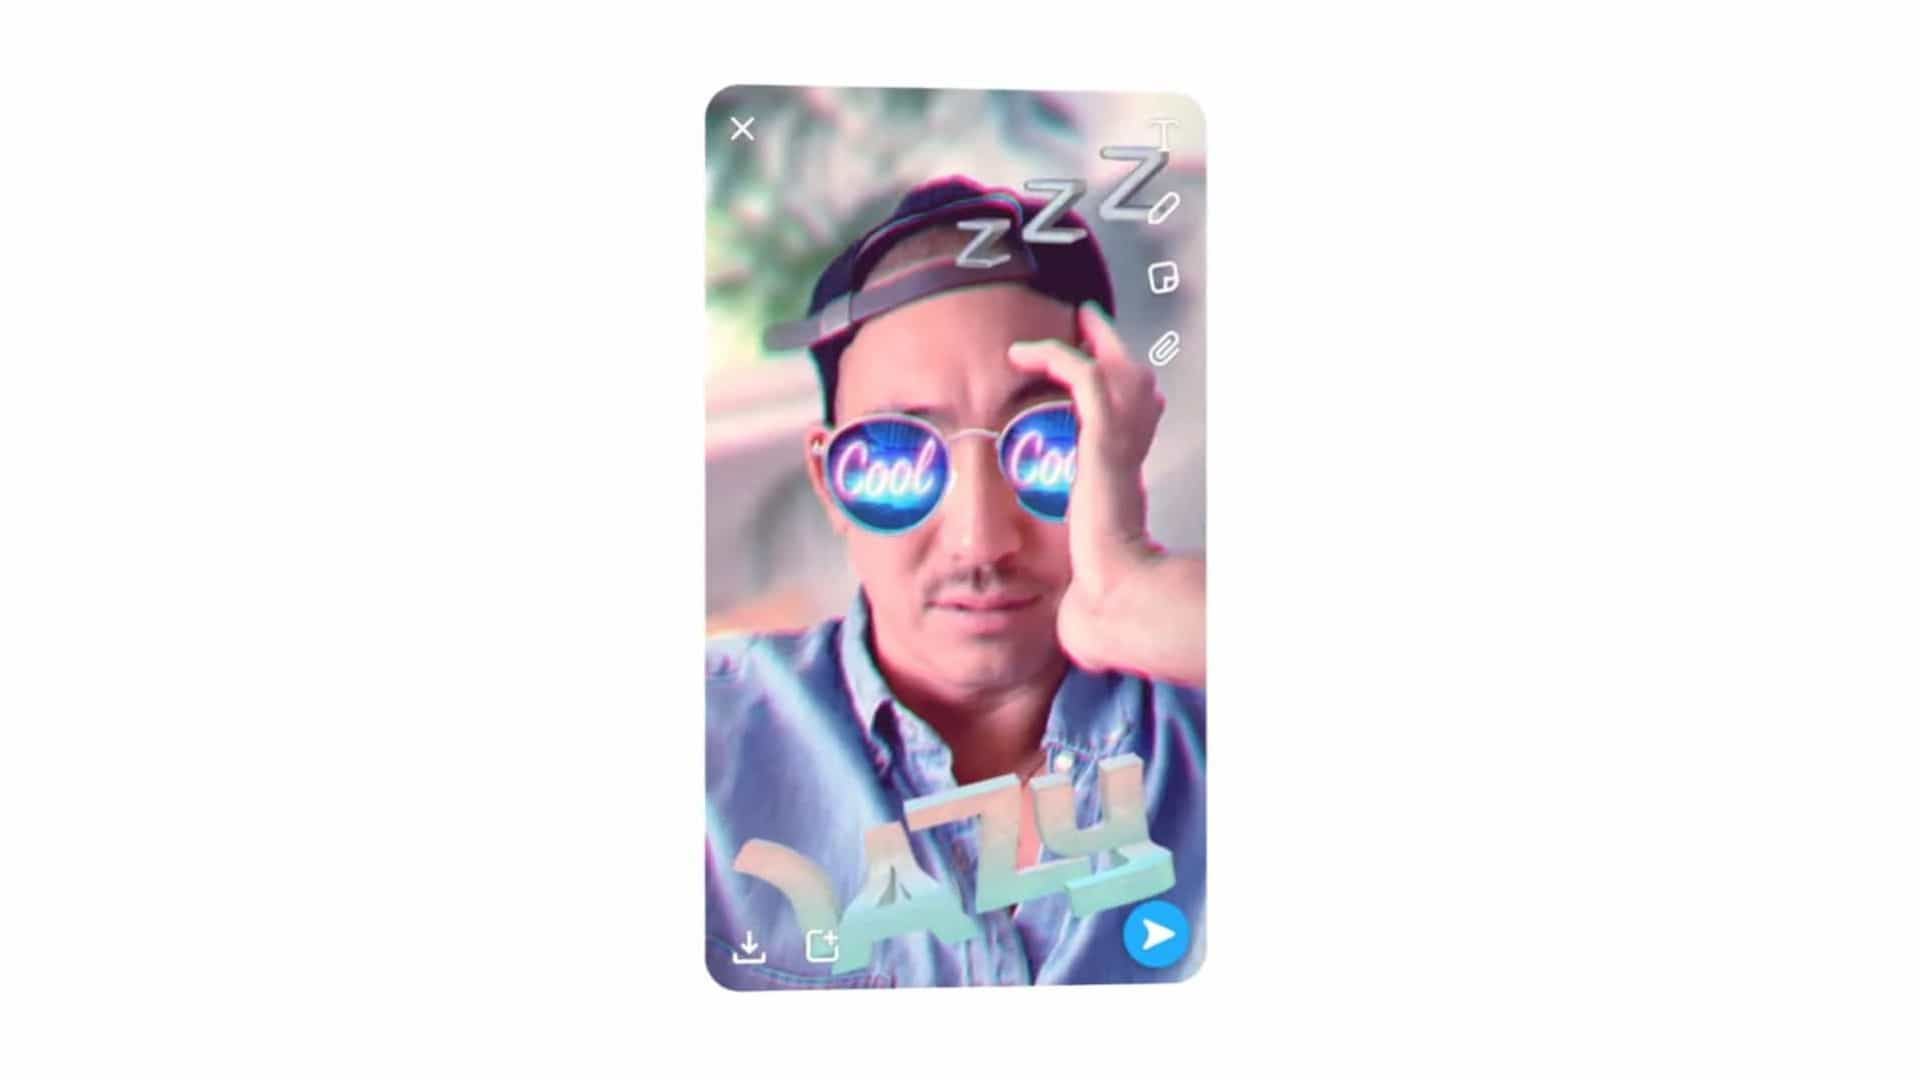 Novo modo de câmara do Snapchat é exclusivo do iPhone